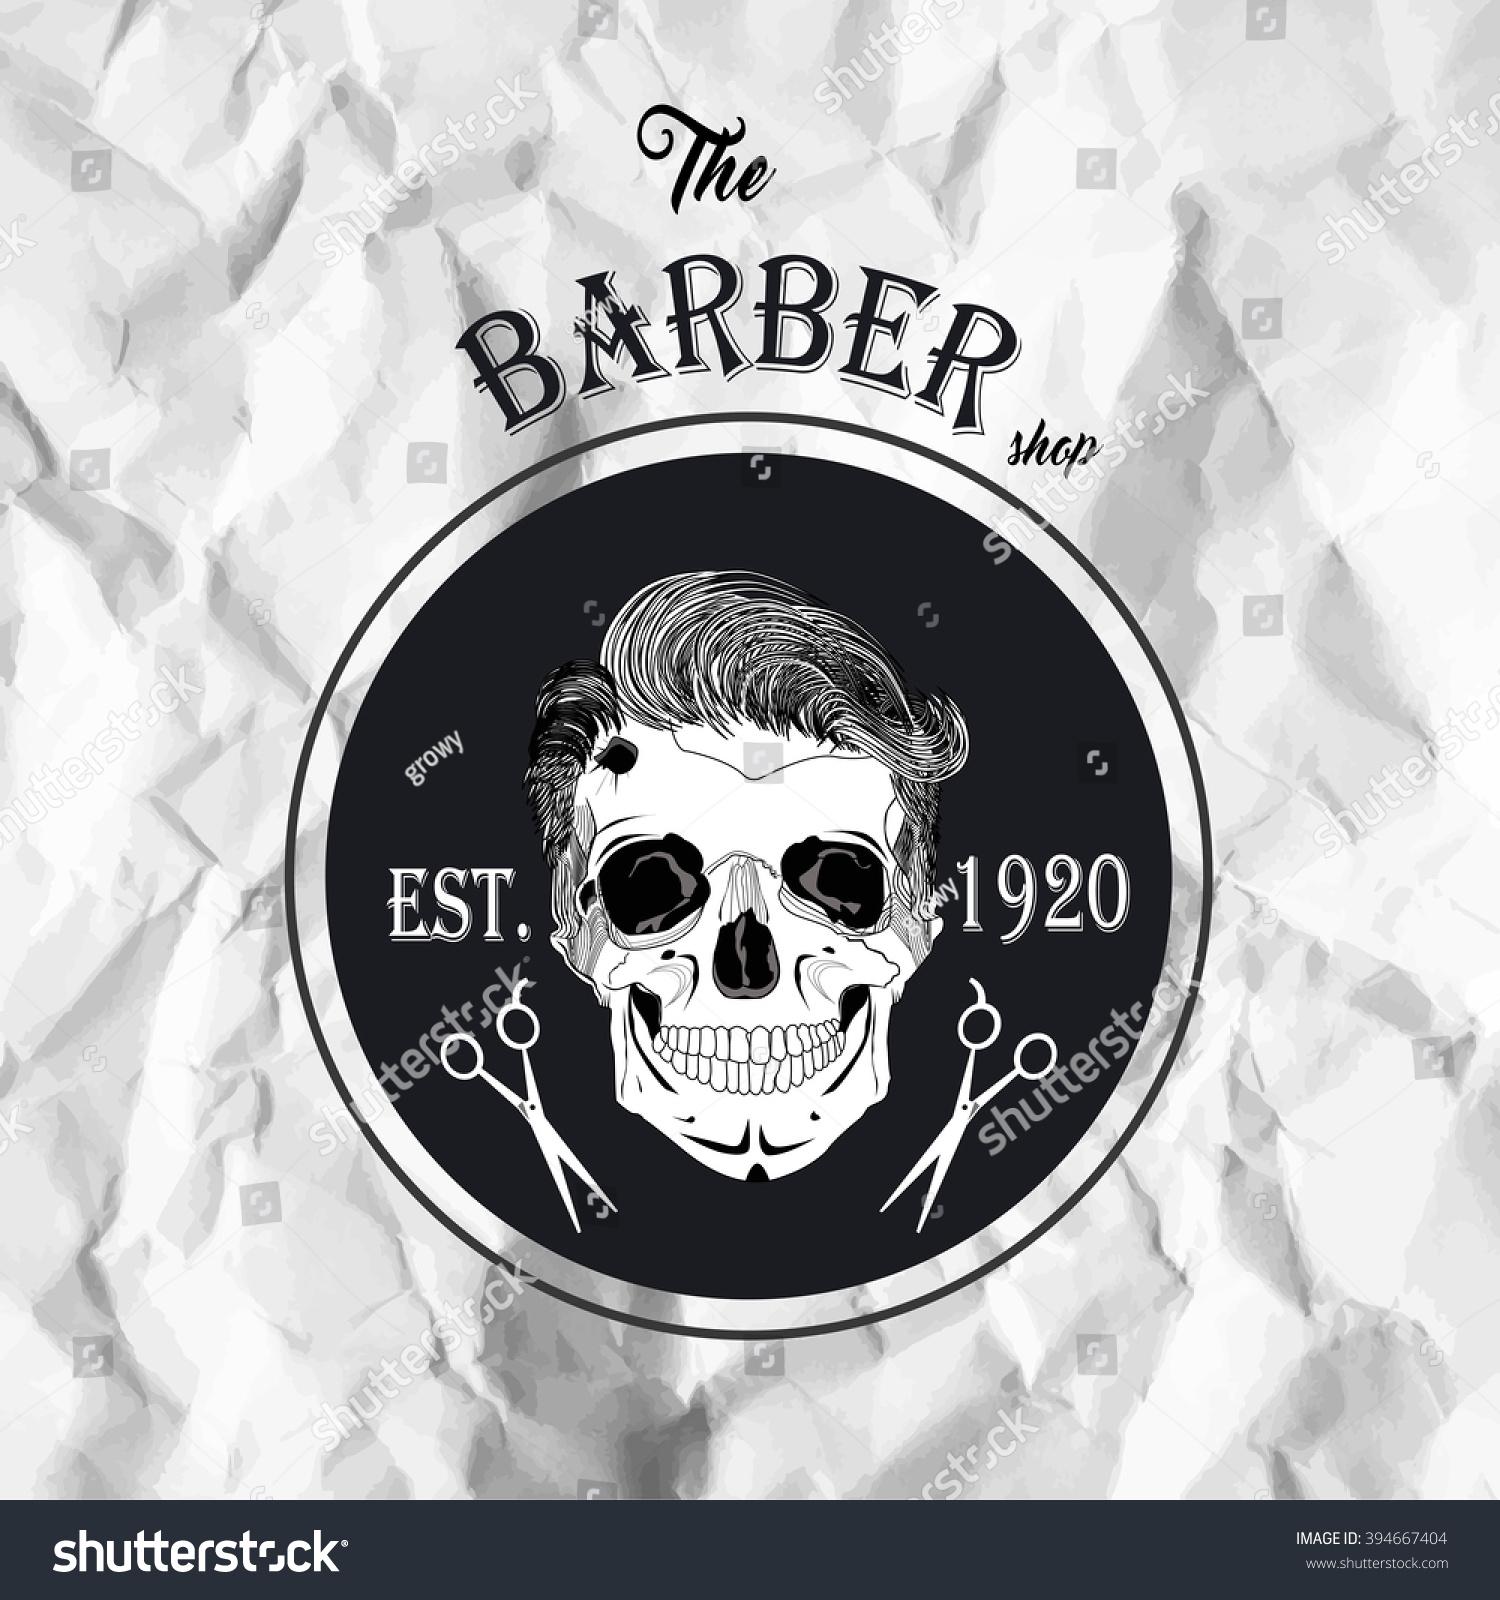 Hipster barber shop business card design stock vector 394667404 hipster barber shop business card design template vector illustration magicingreecefo Choice Image